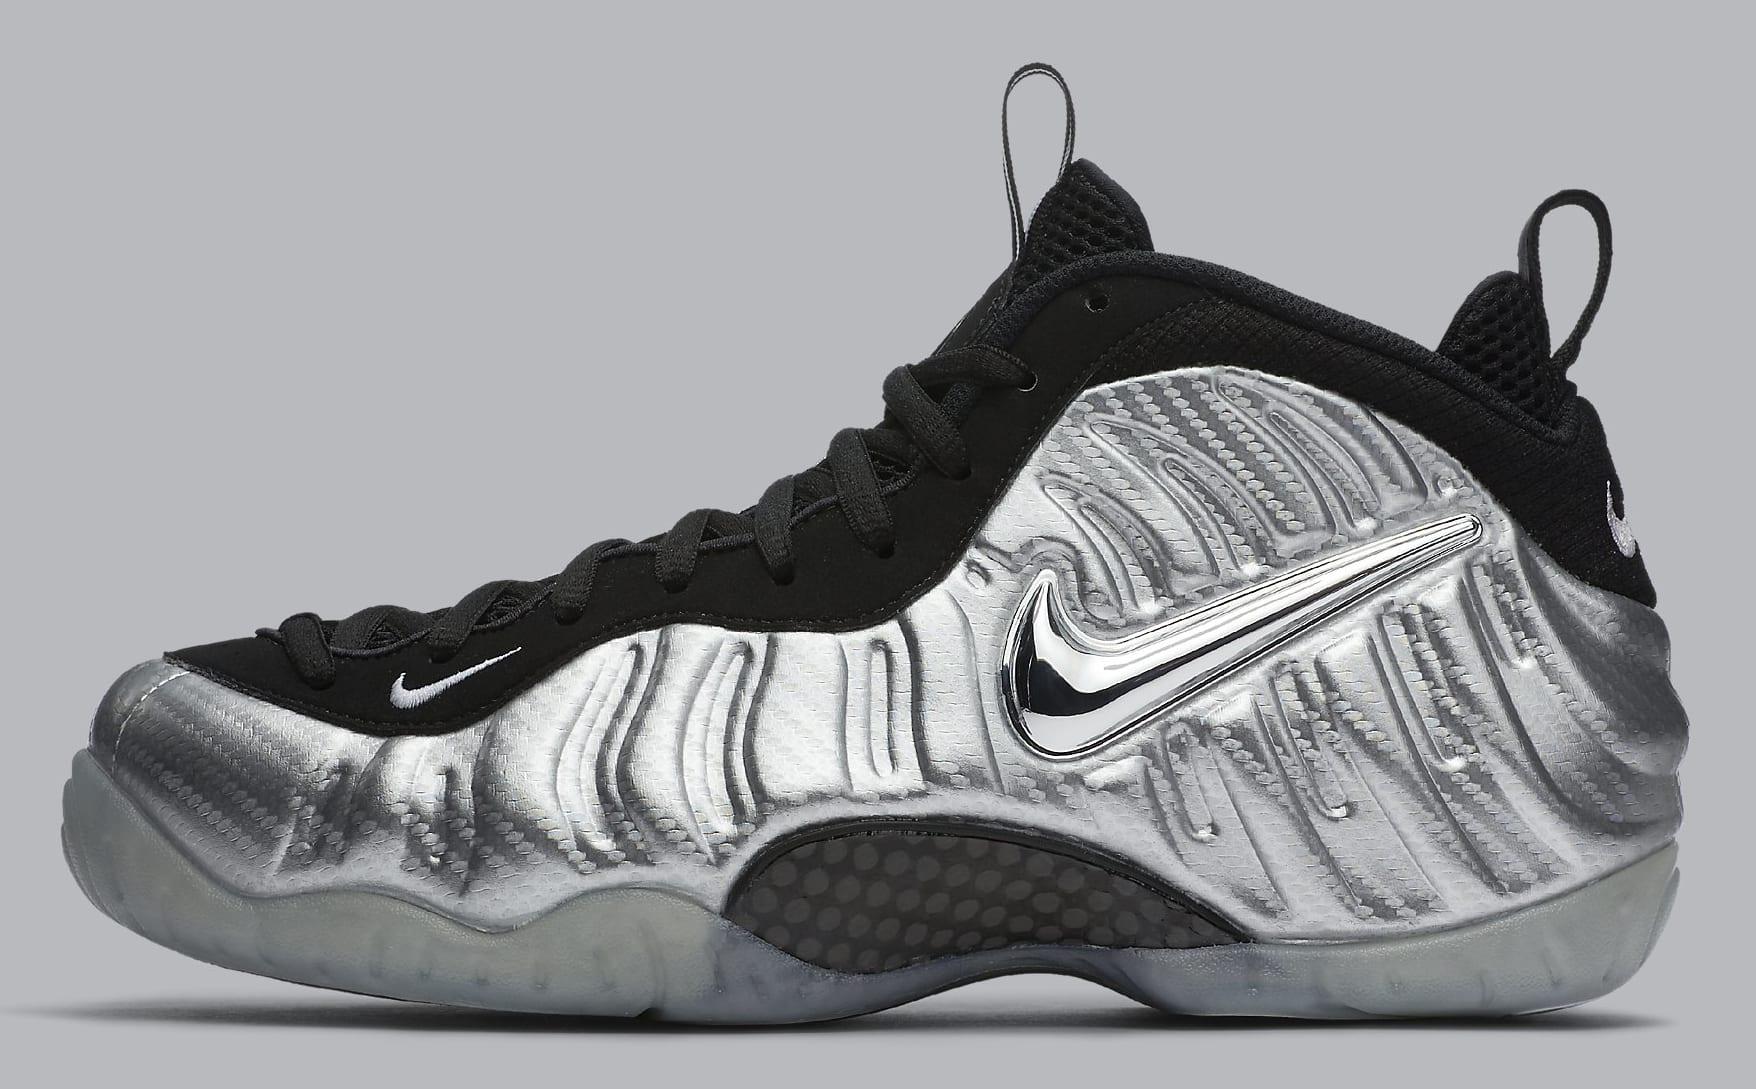 Silver Nike Foamposite Pro Carbon Fiber